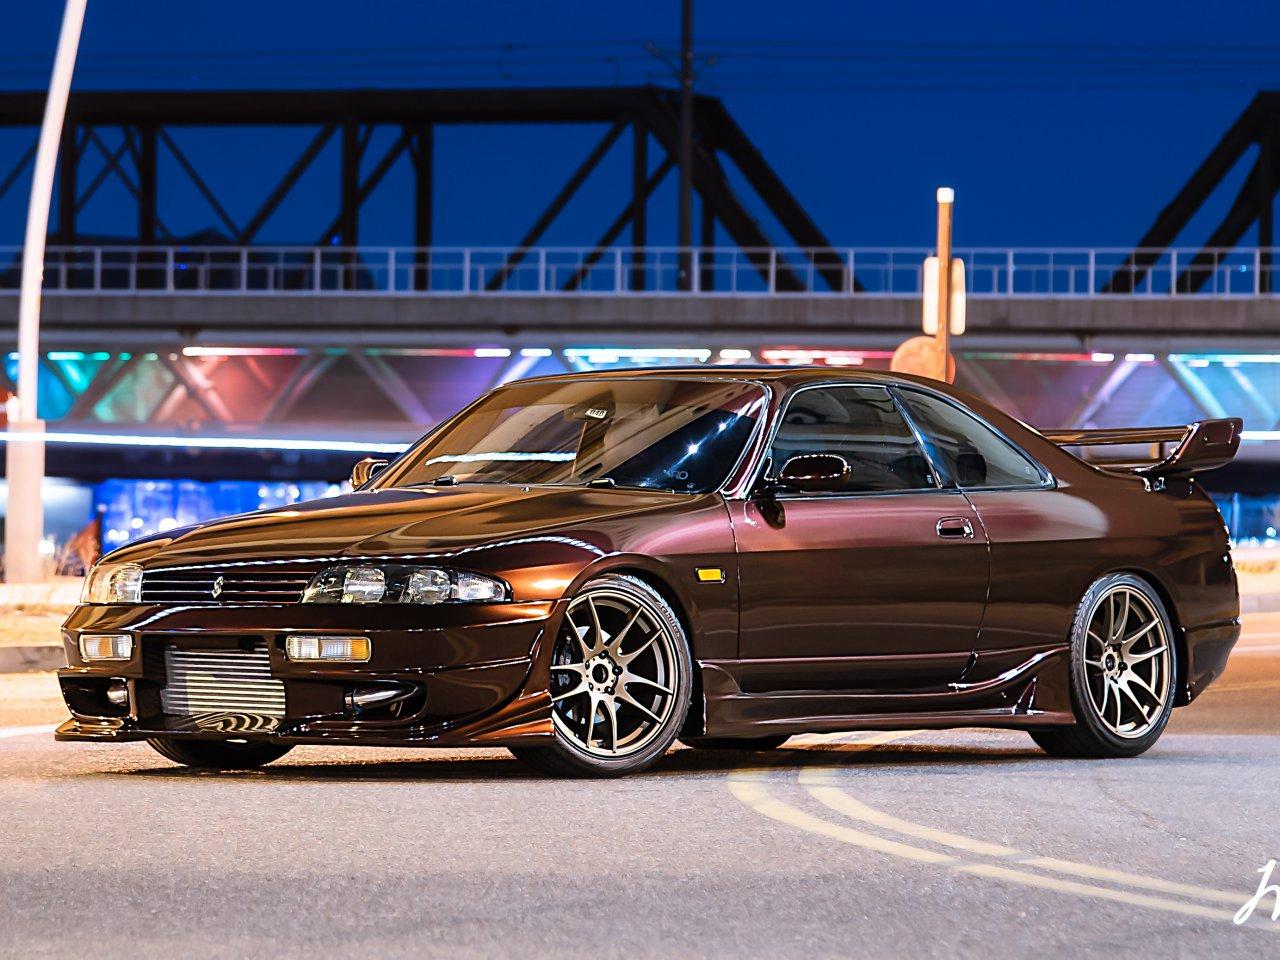 1993 Nissan Skyline R33 GTST